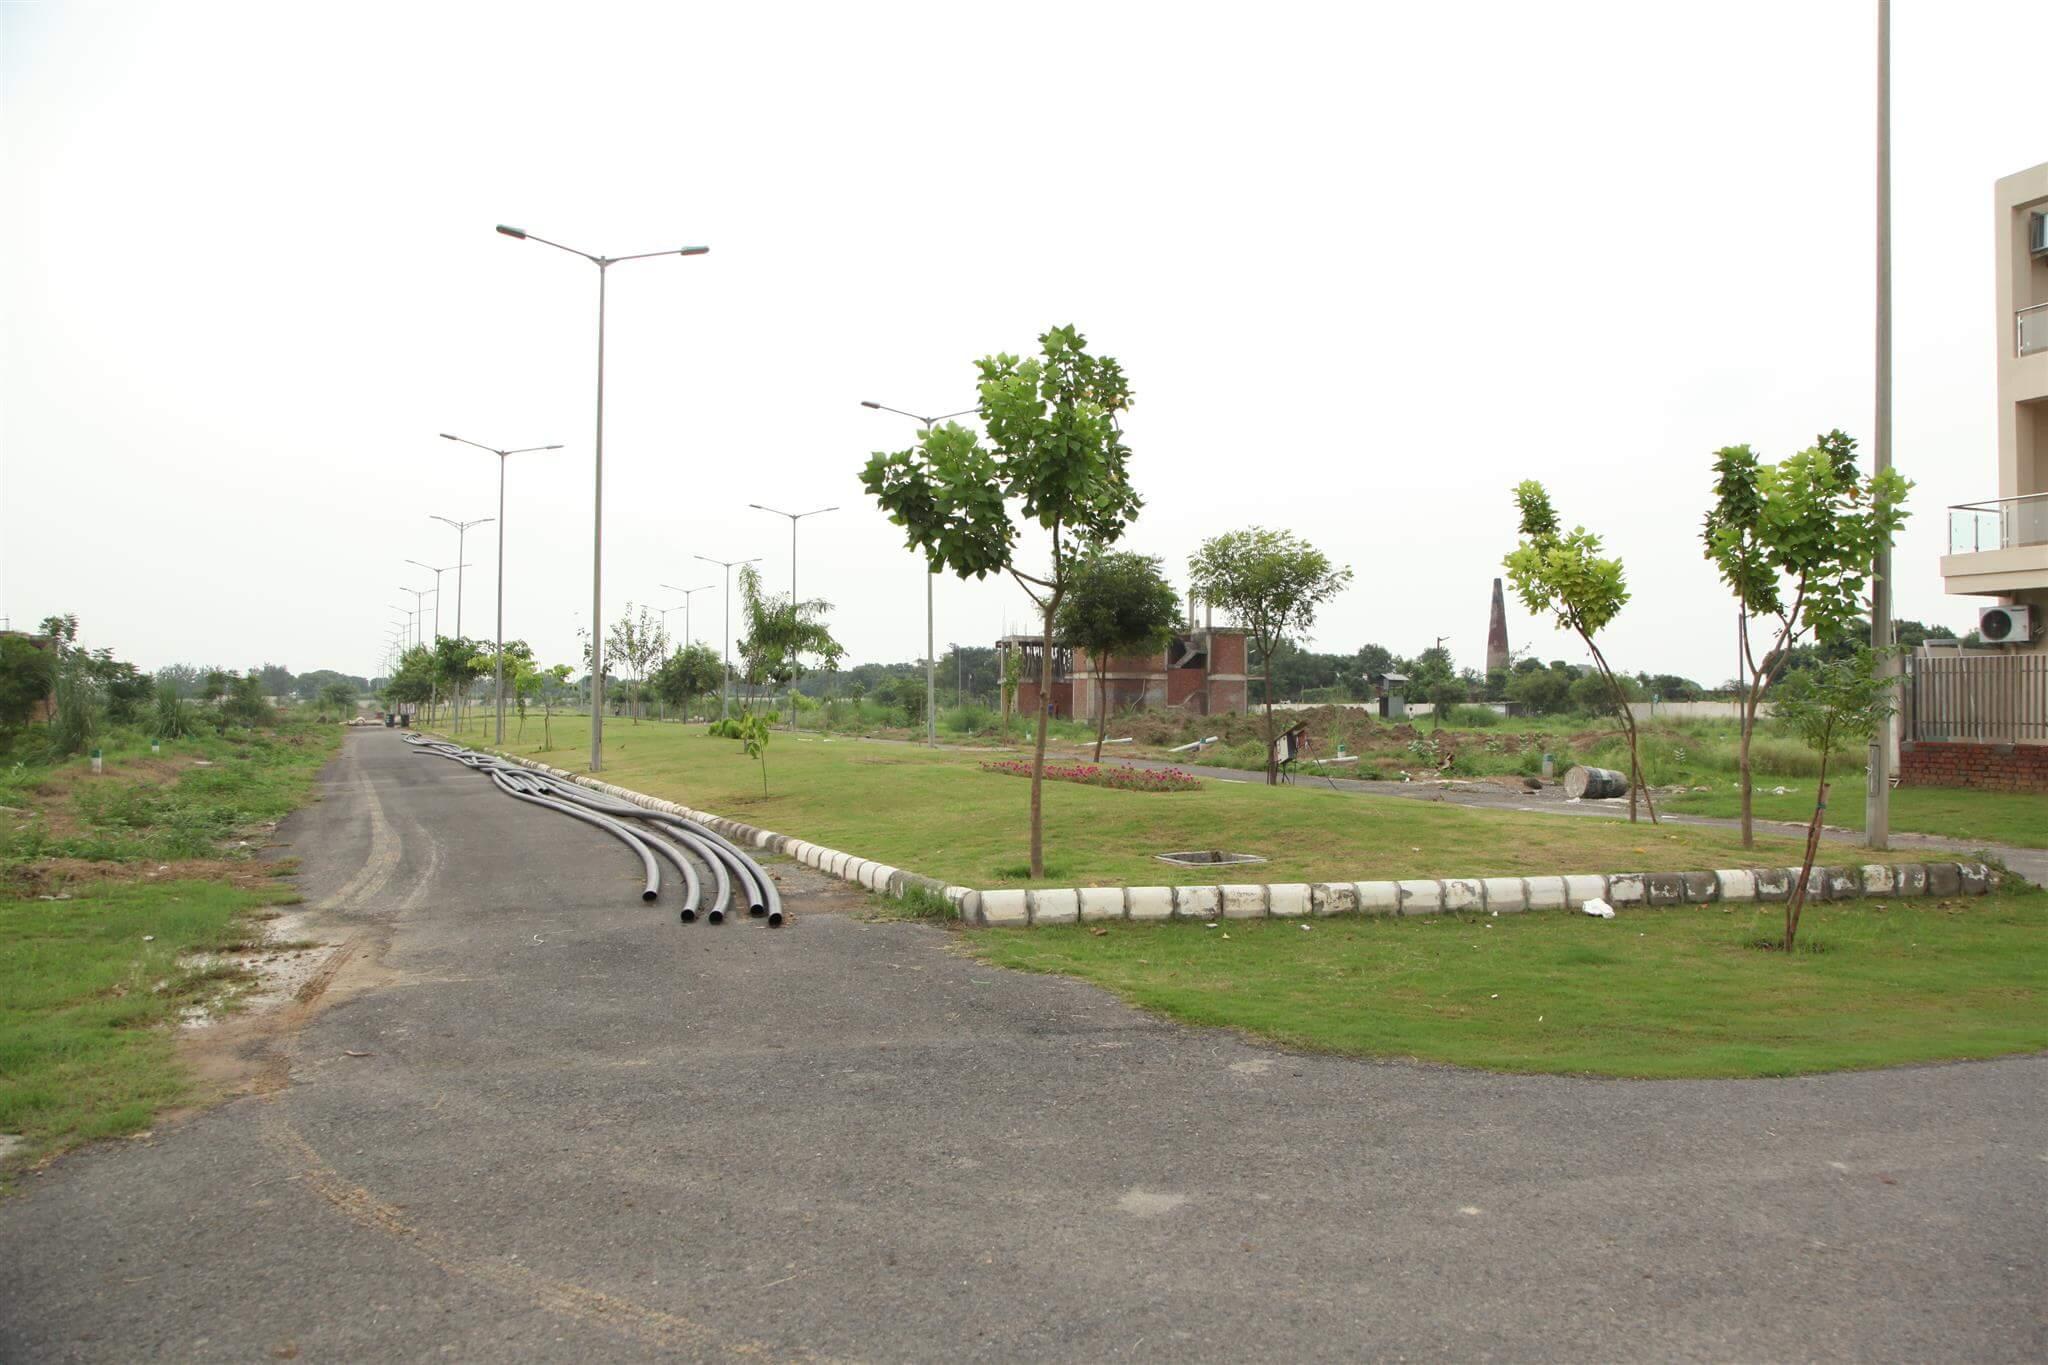 gaur yamuna city 32nd park view greens image3